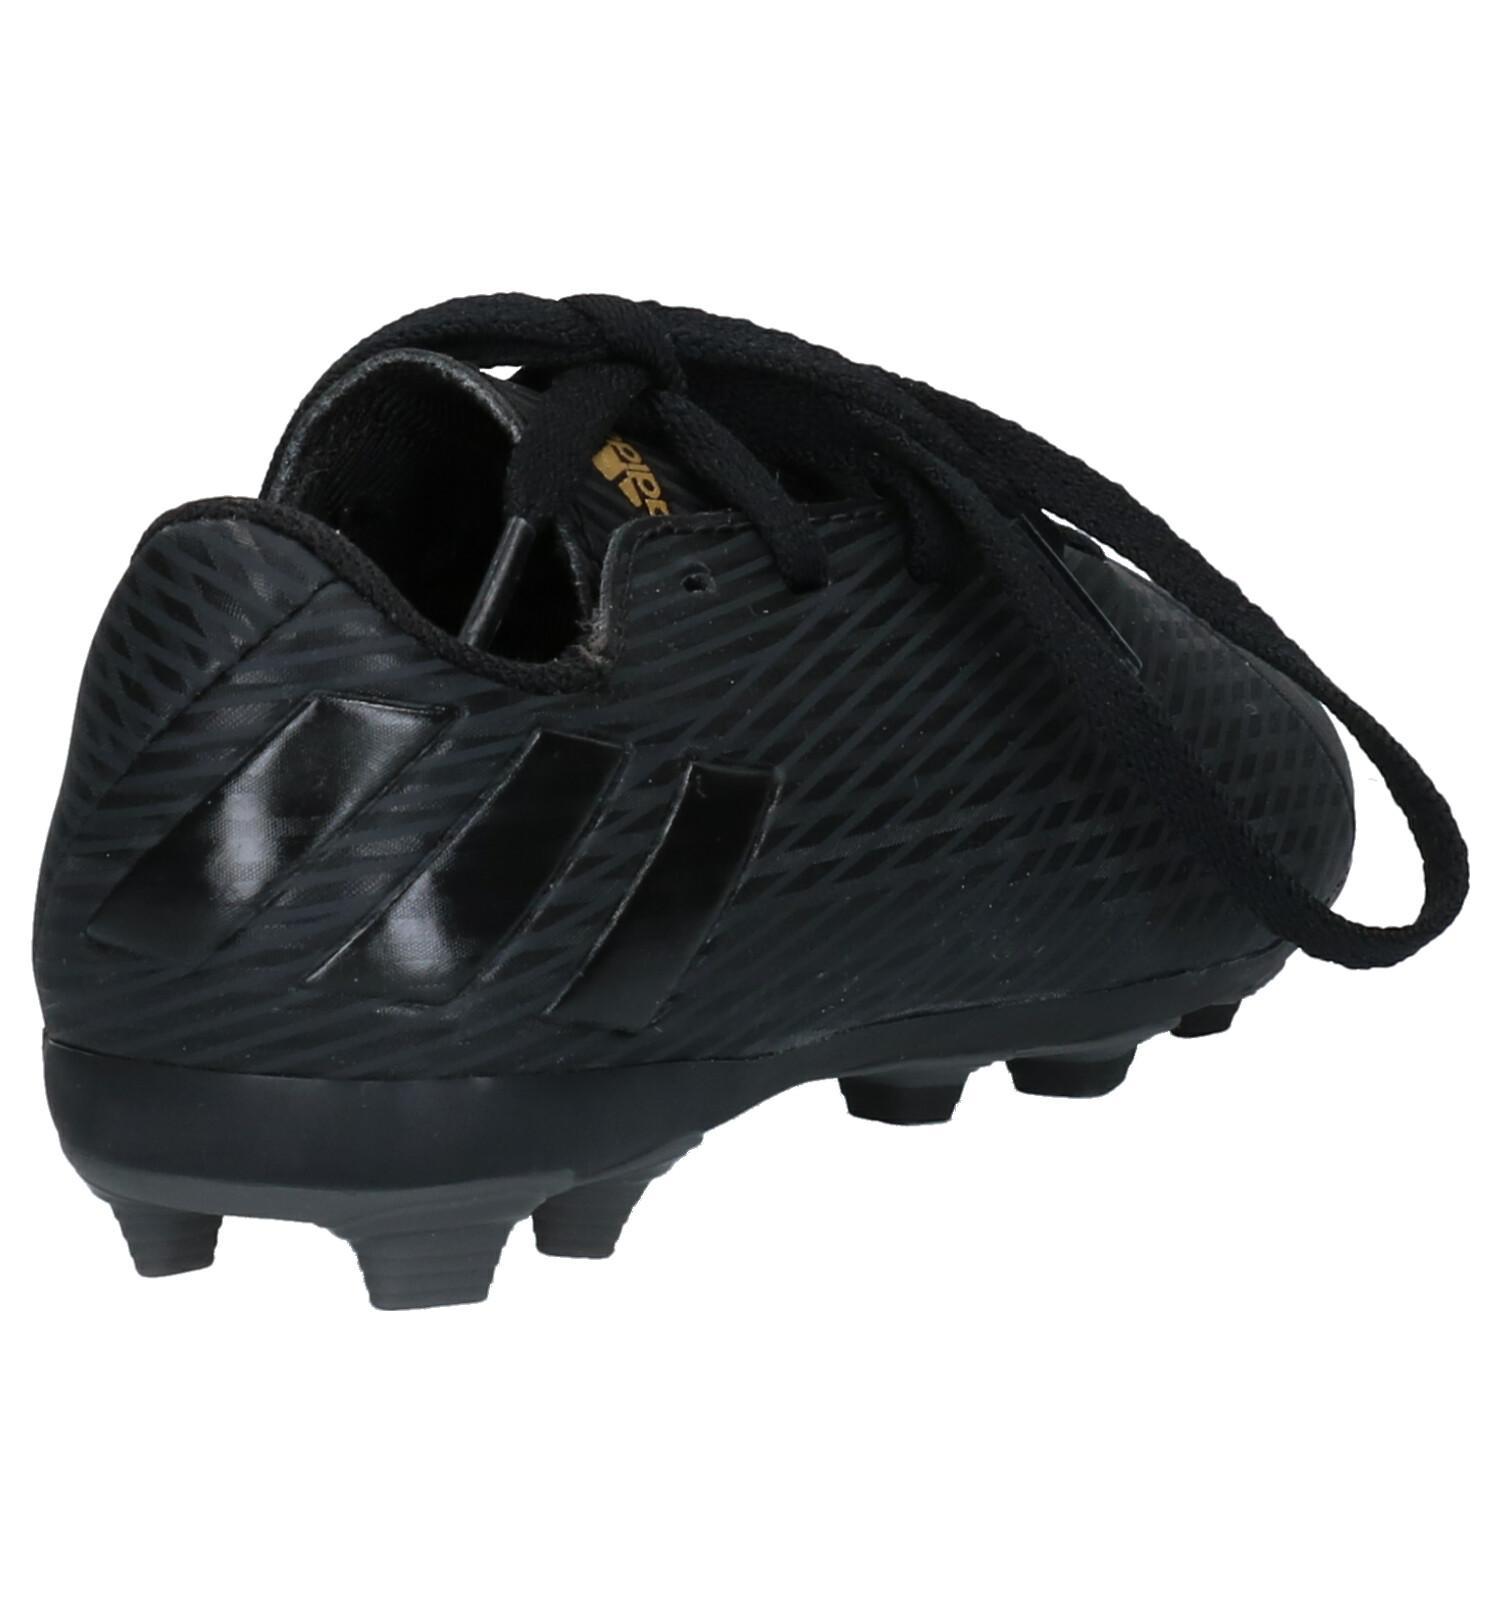 adidas Nemiziz Messi Zwarte Voetbalschoenen | TORFS.BE | Gratis verzend en retour